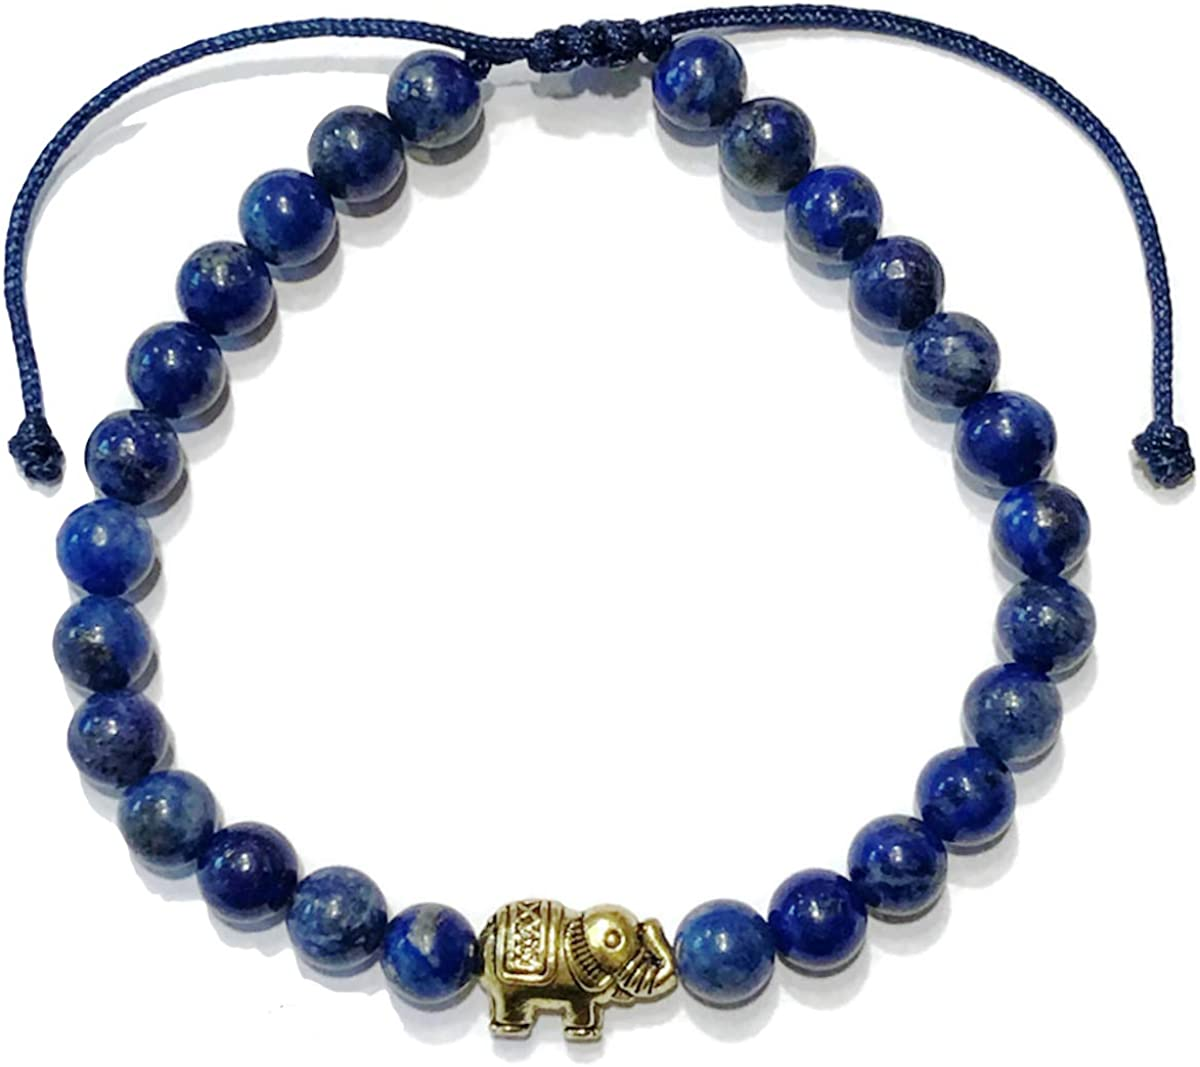 Tiny Treasures Love Charm Dark Blue Jade Adjustable Reiki Meditation Lucky Knot Bracelet Love Bracelet